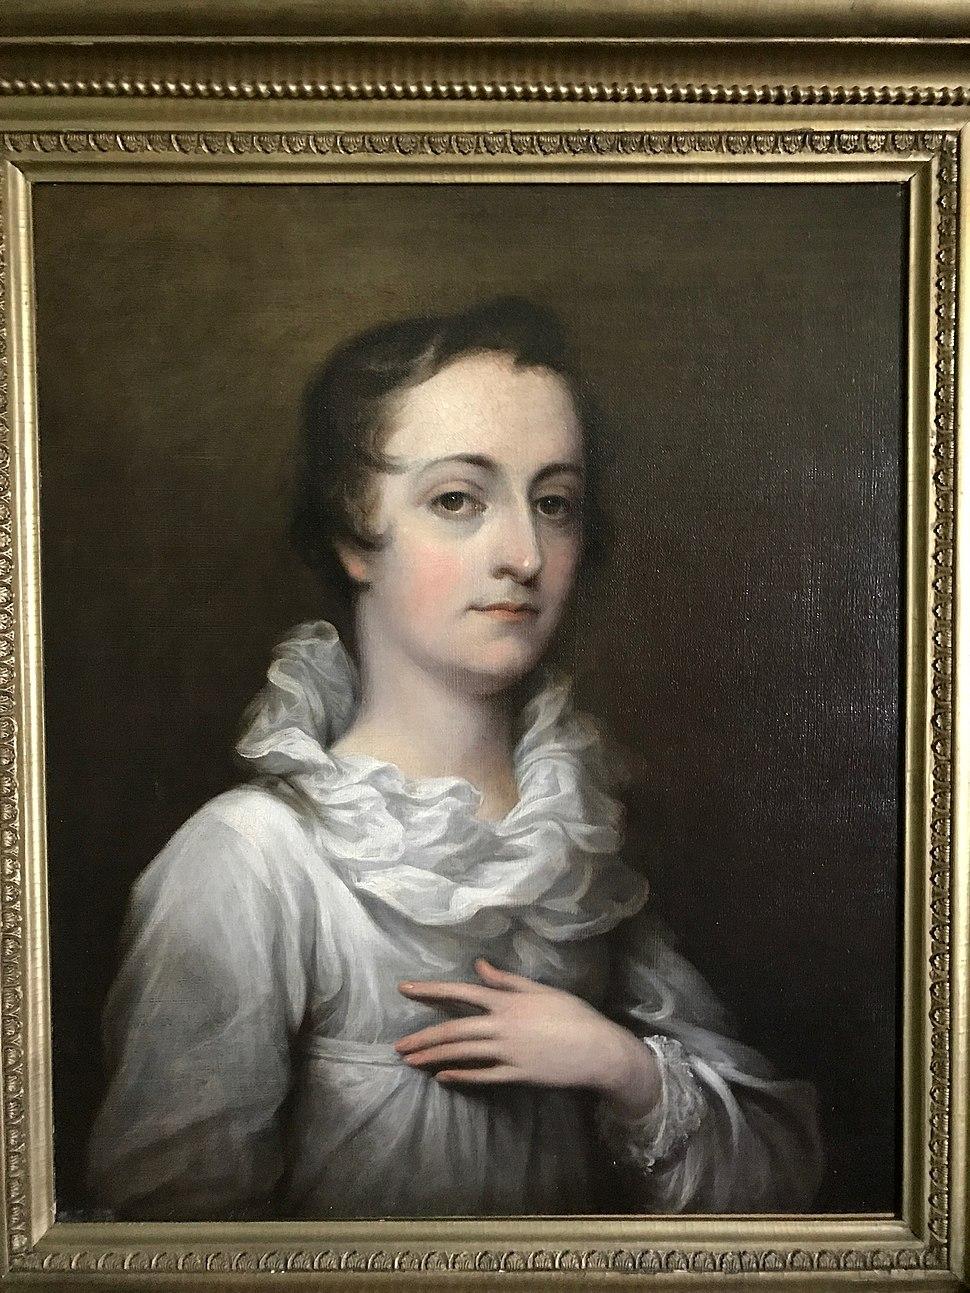 John Trumbull, Lady in White